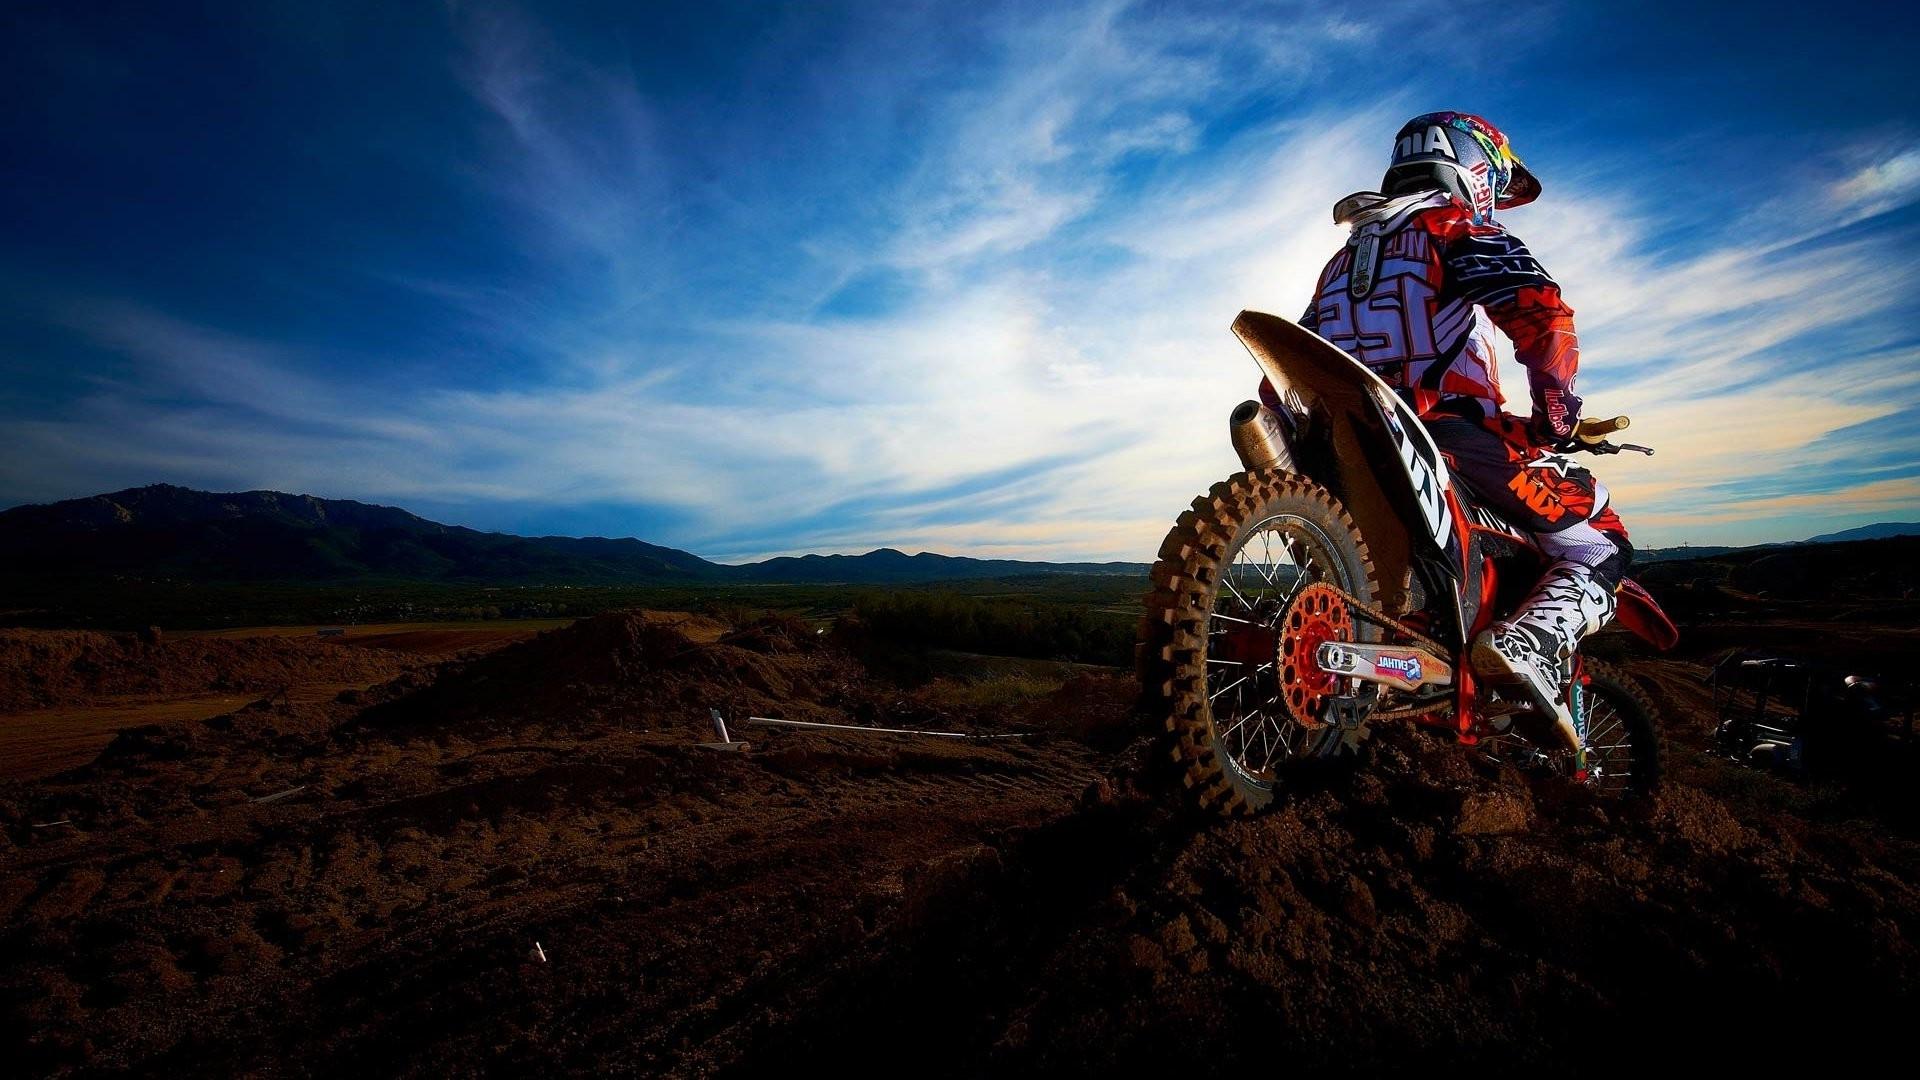 Honda Motocross Wallpapers Group 1920x1080